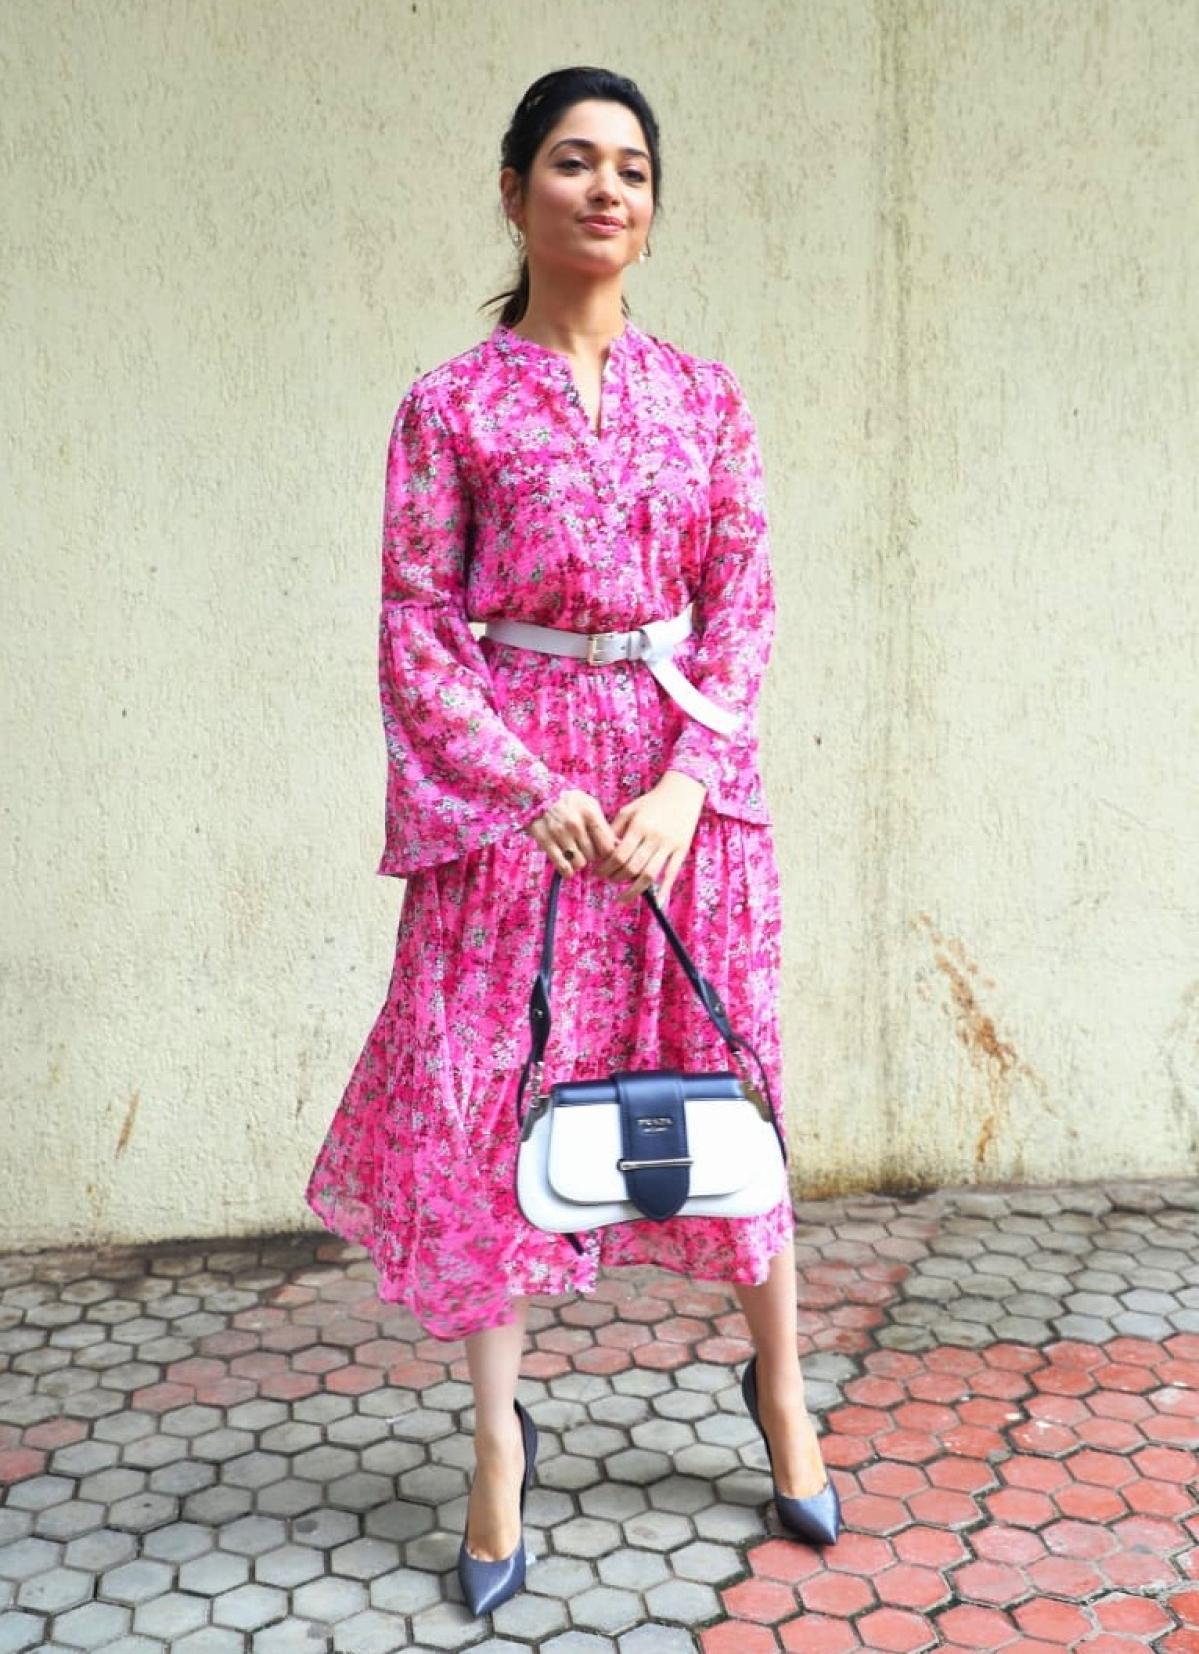 Cost of Tamannah Bhatia's Prada Bag can get you a Manish Malhotra lehenga!